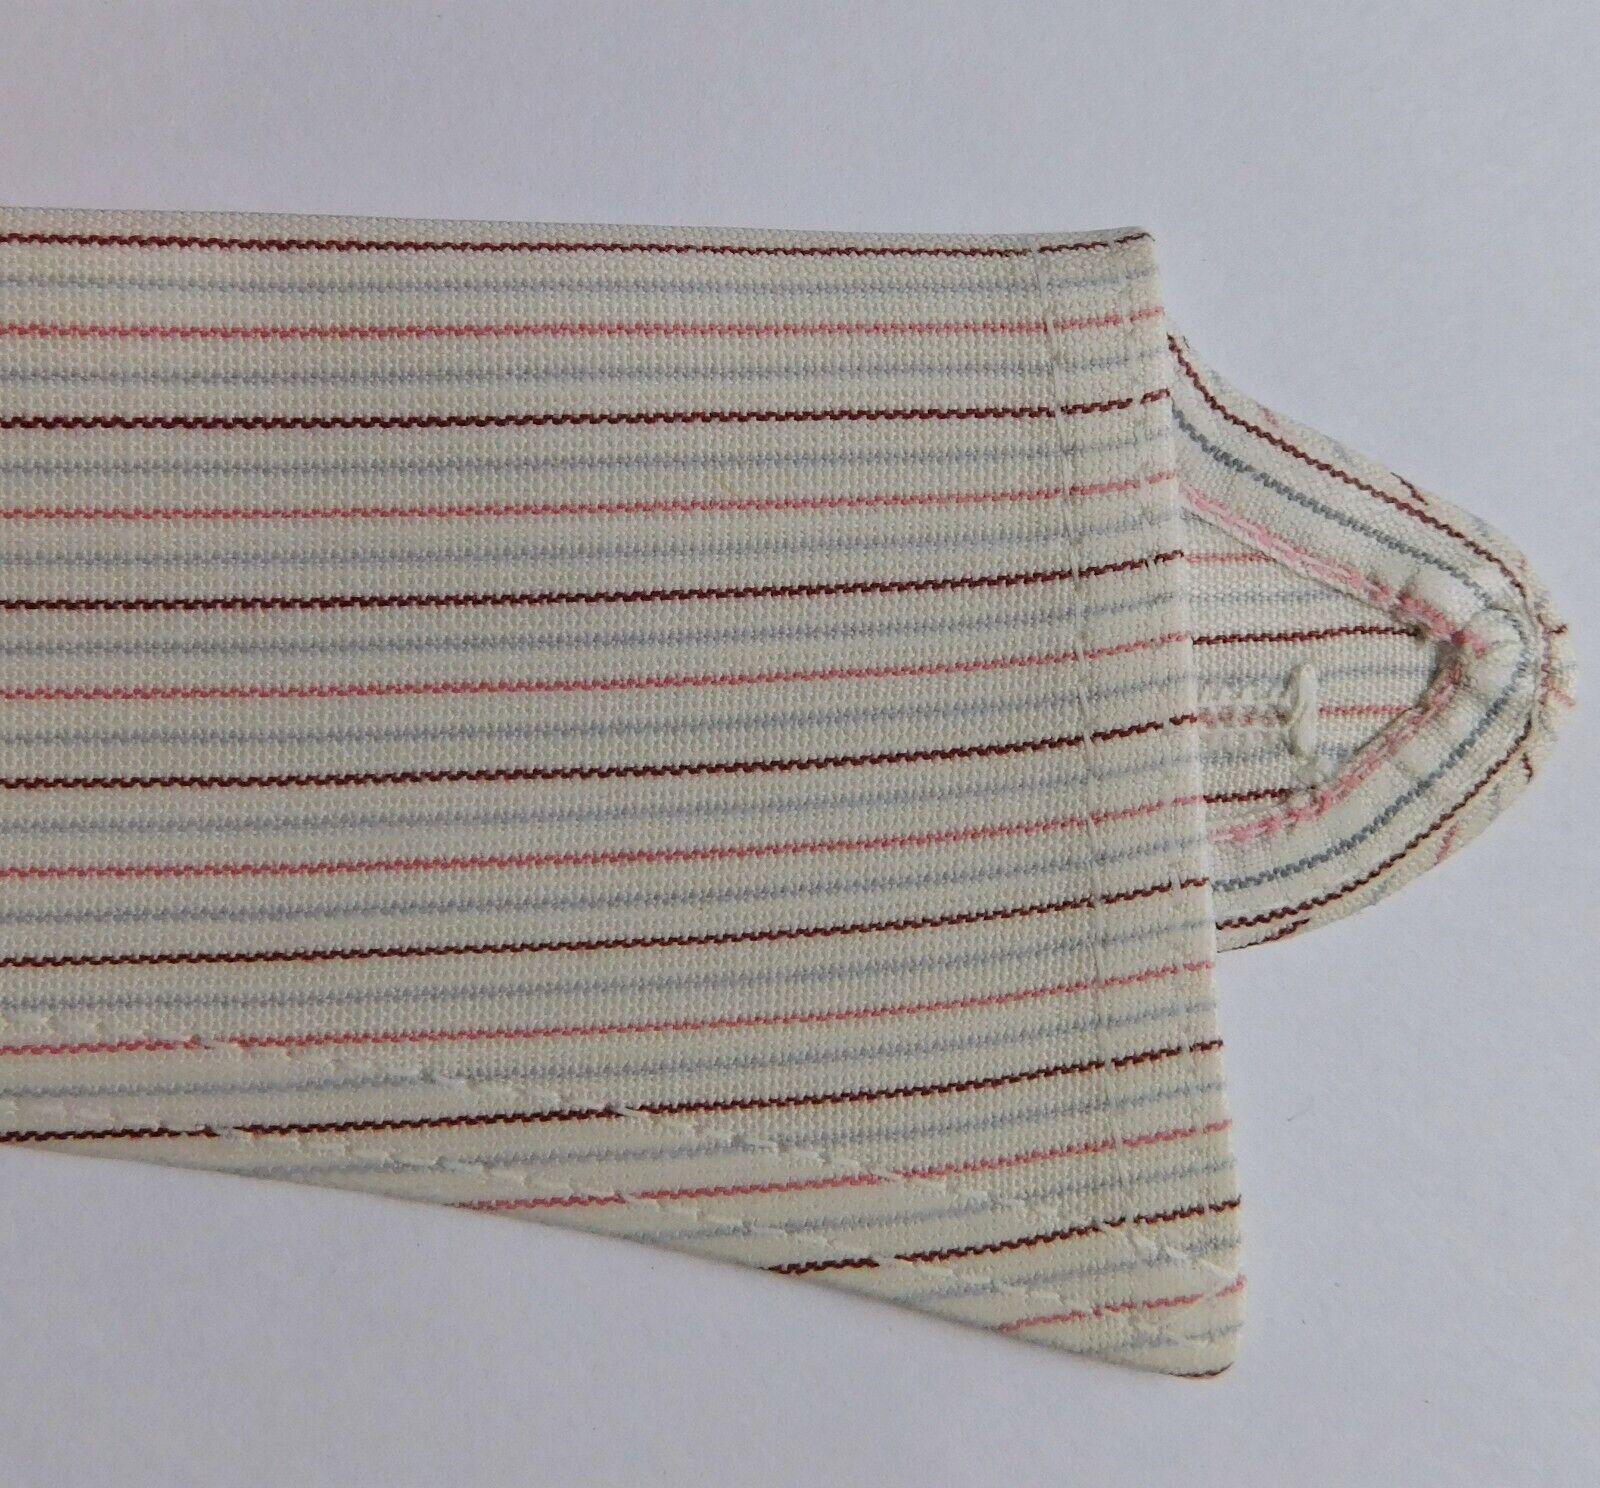 Pink red striped shirt collar size 14.5 Radiac Rex UNUSED detachable men women